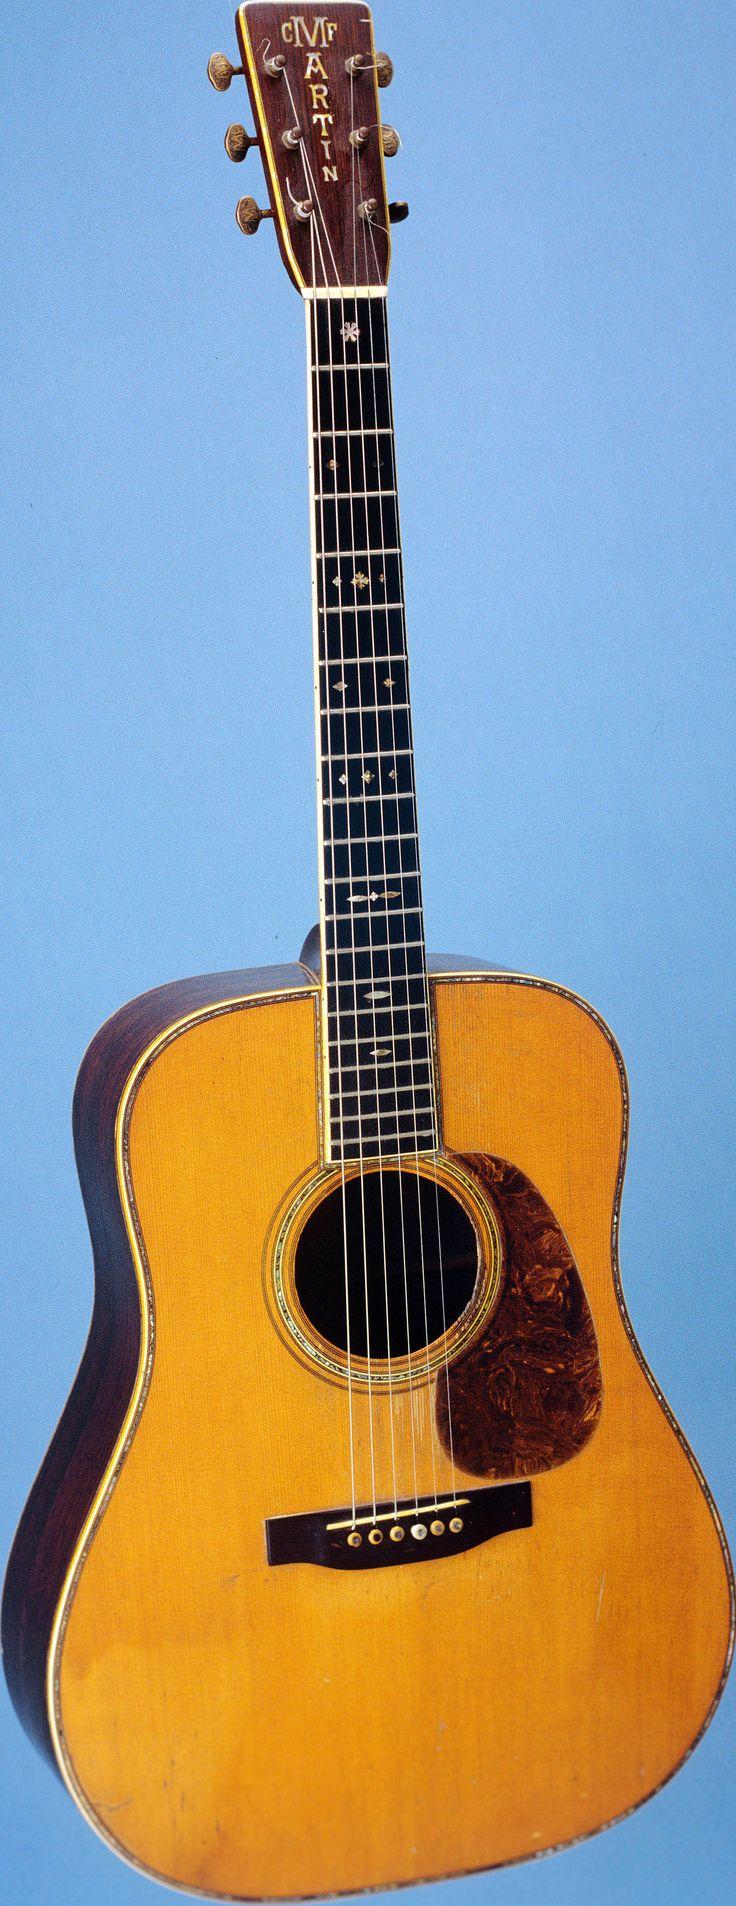 1938 Martin D-45 Acoustic Guitar                                                                                                                                                                                 More